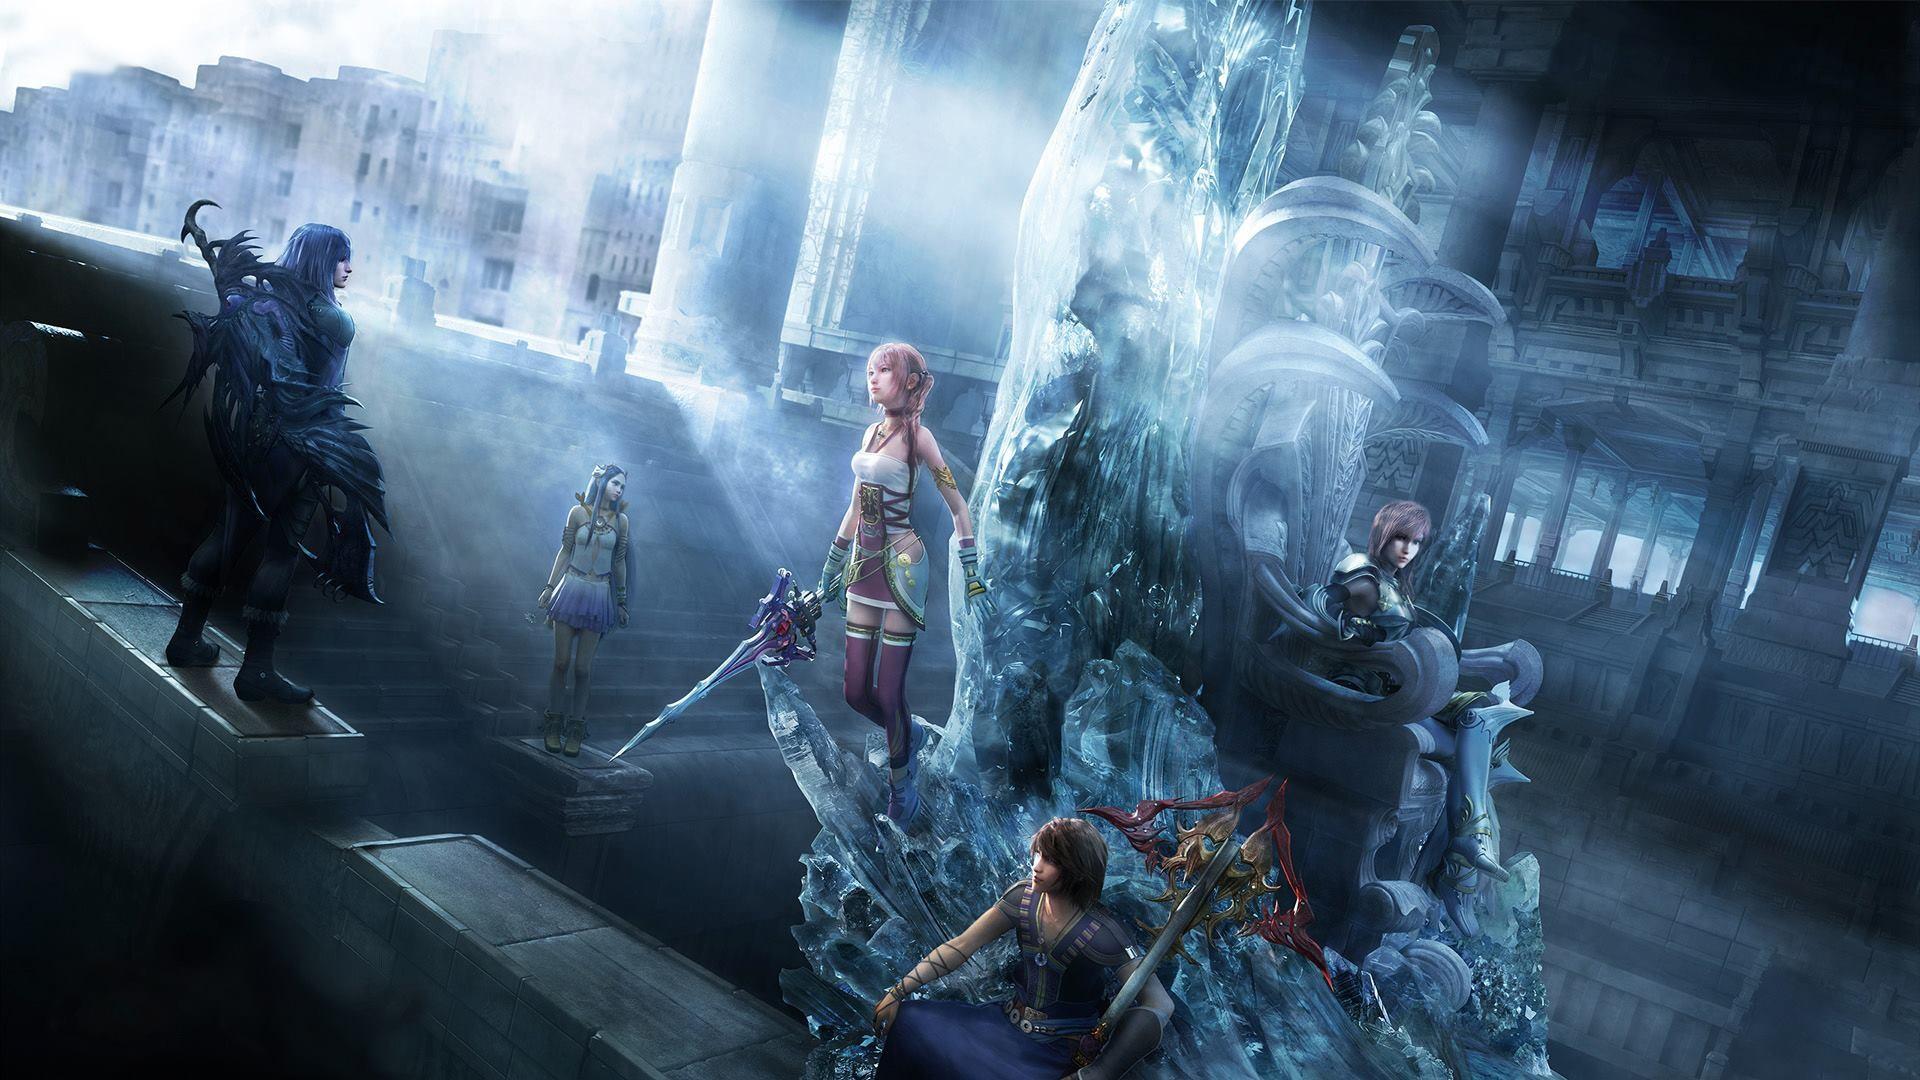 1920x1080 View Fullsize Final Fantasy XIII Image